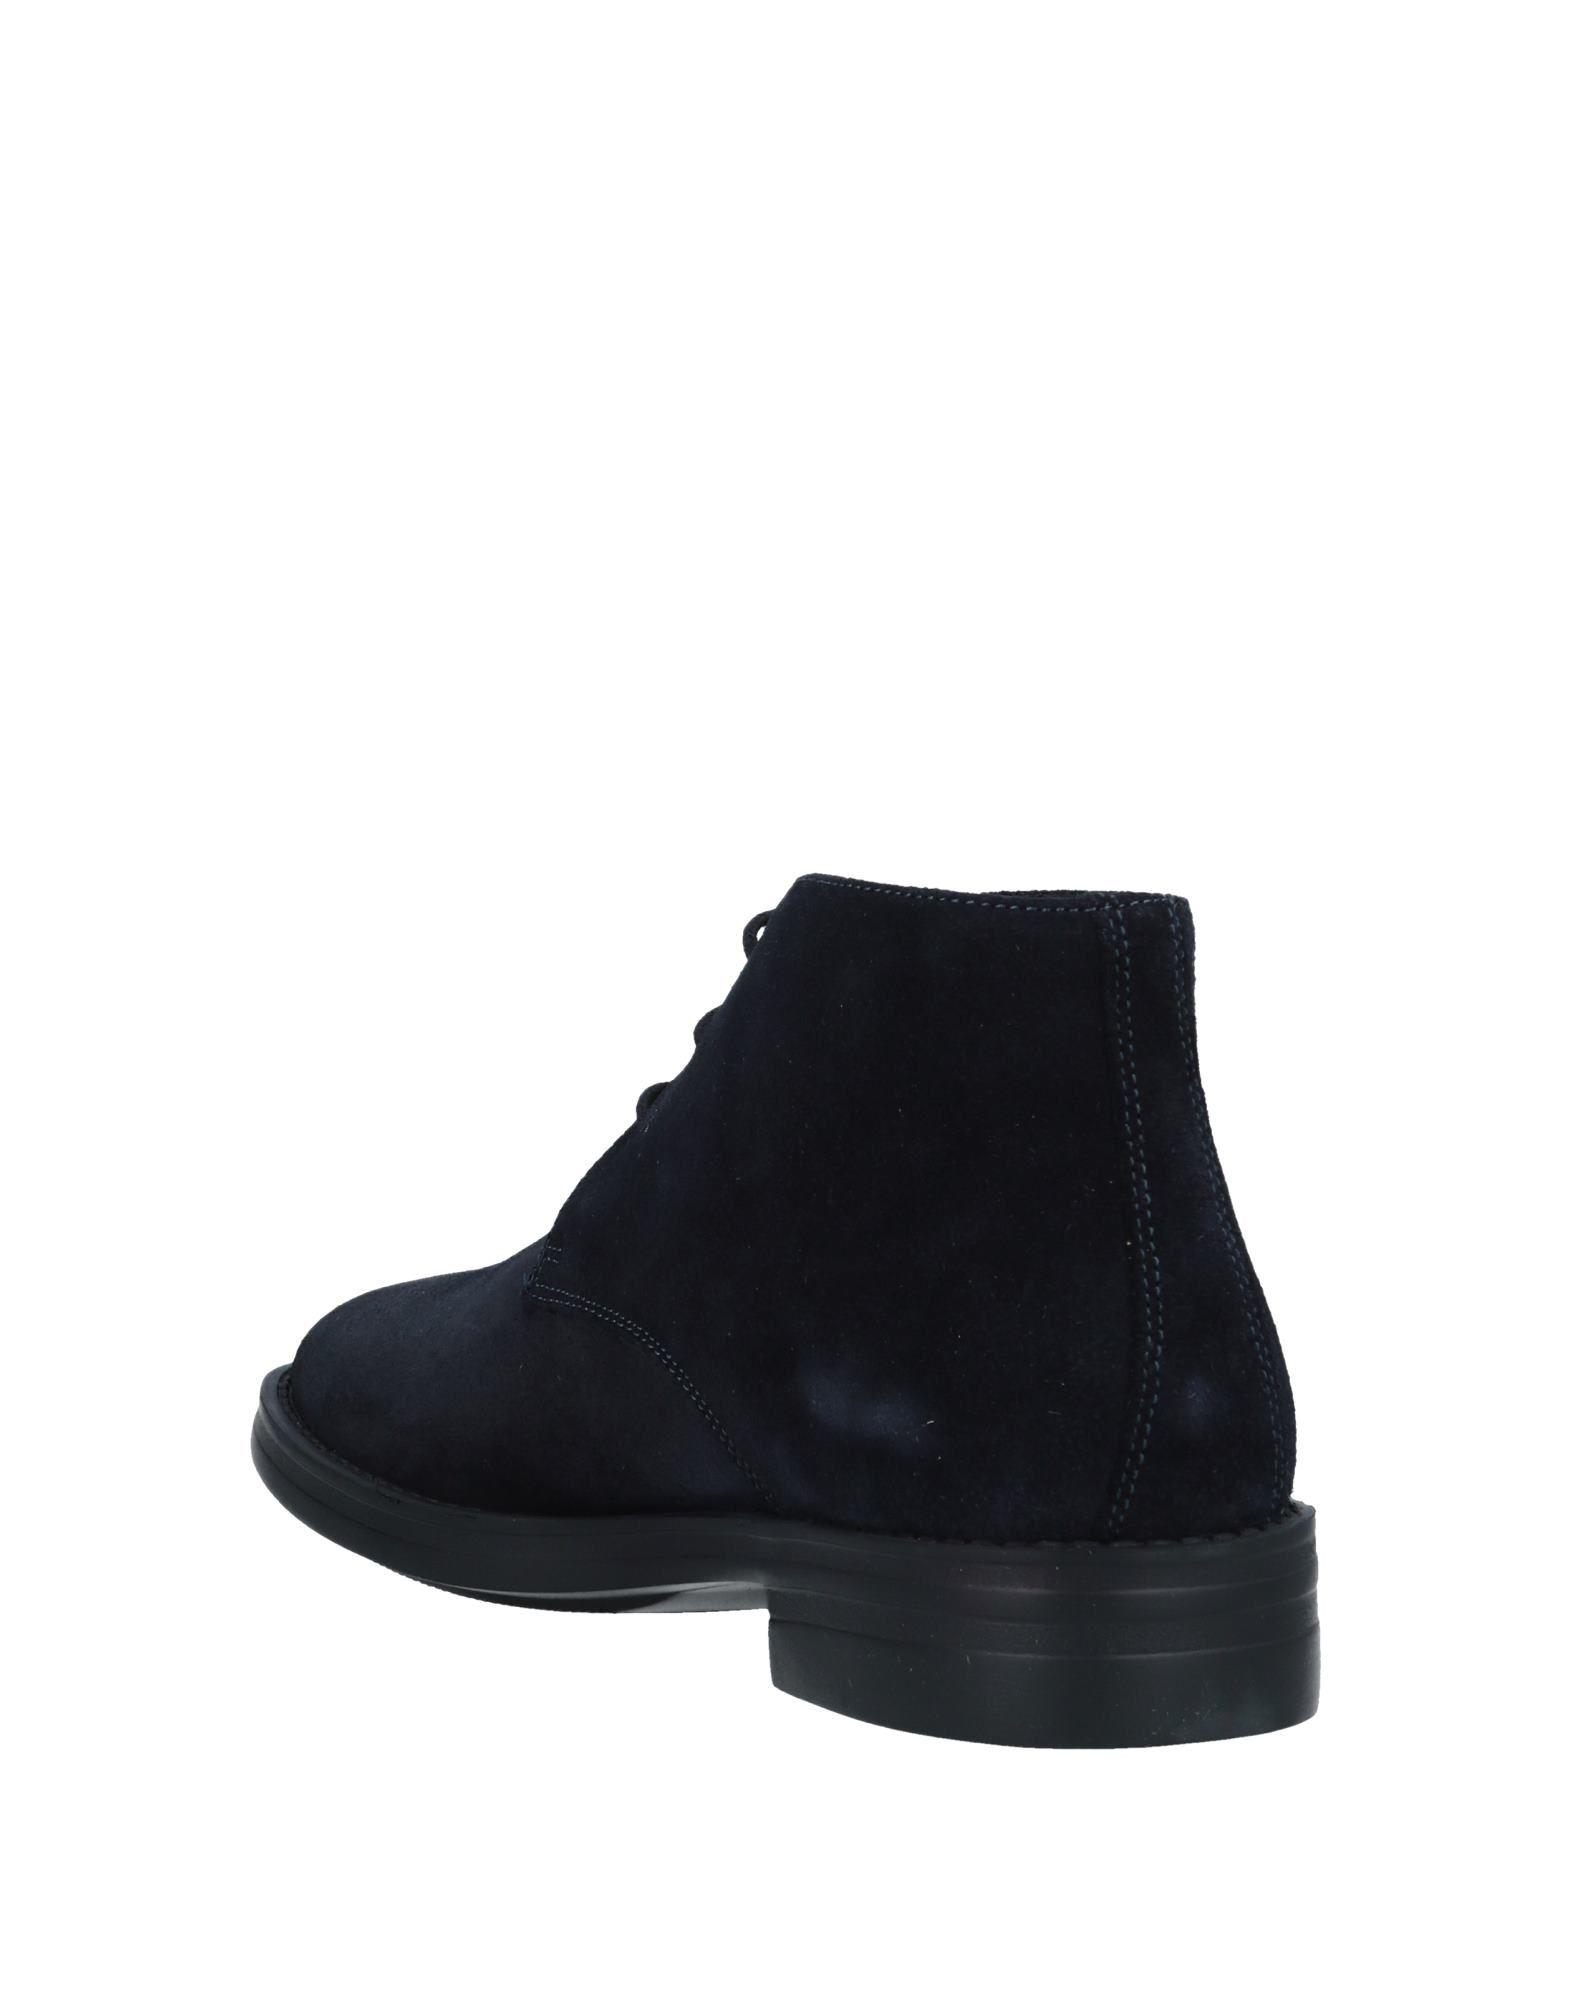 Antica Antica Cuoieria Boots - Men Antica Antica Cuoieria Boots online on  Canada - 11547169IL d19c6d